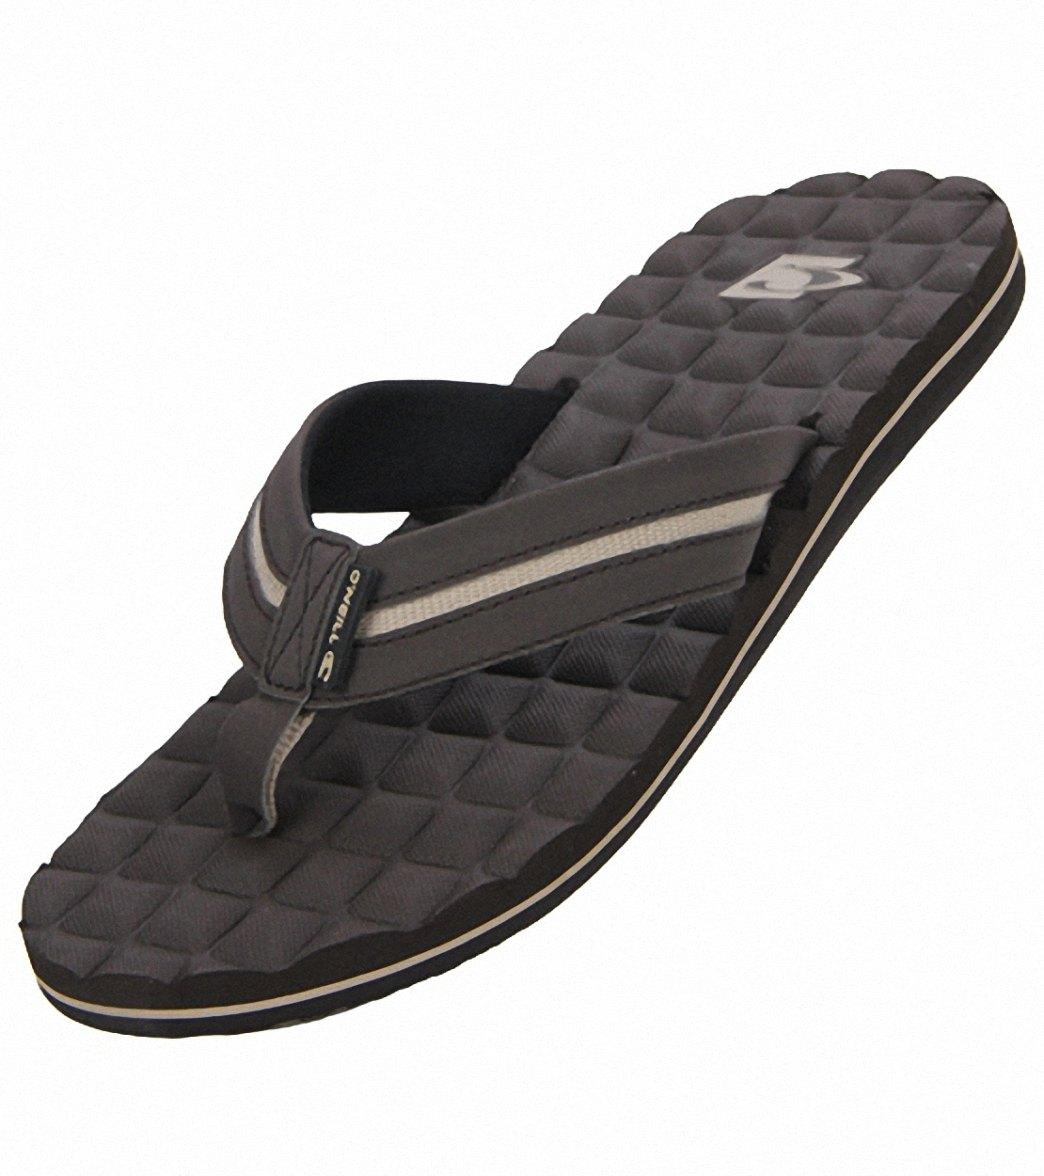 43a3e691da52 O Neill Men s Koosh N Squared Sandals at SwimOutlet.com